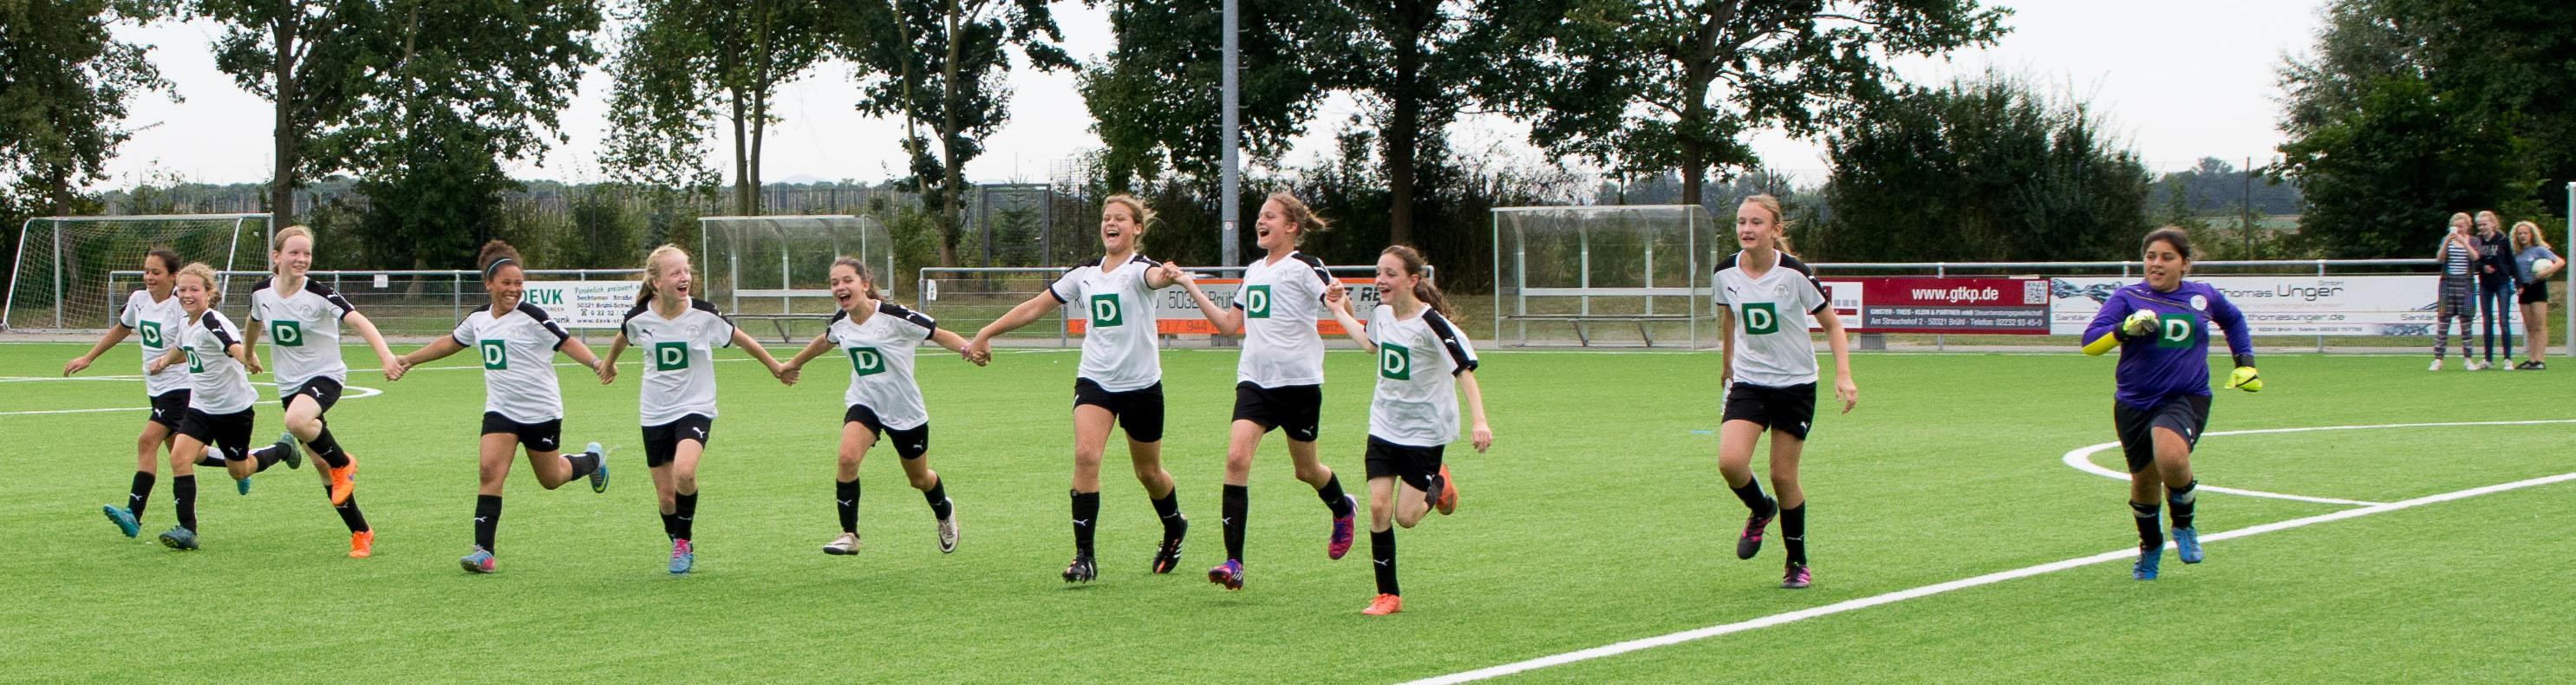 Auswärtsspiel FSV Brühl gegen ESV Olympia